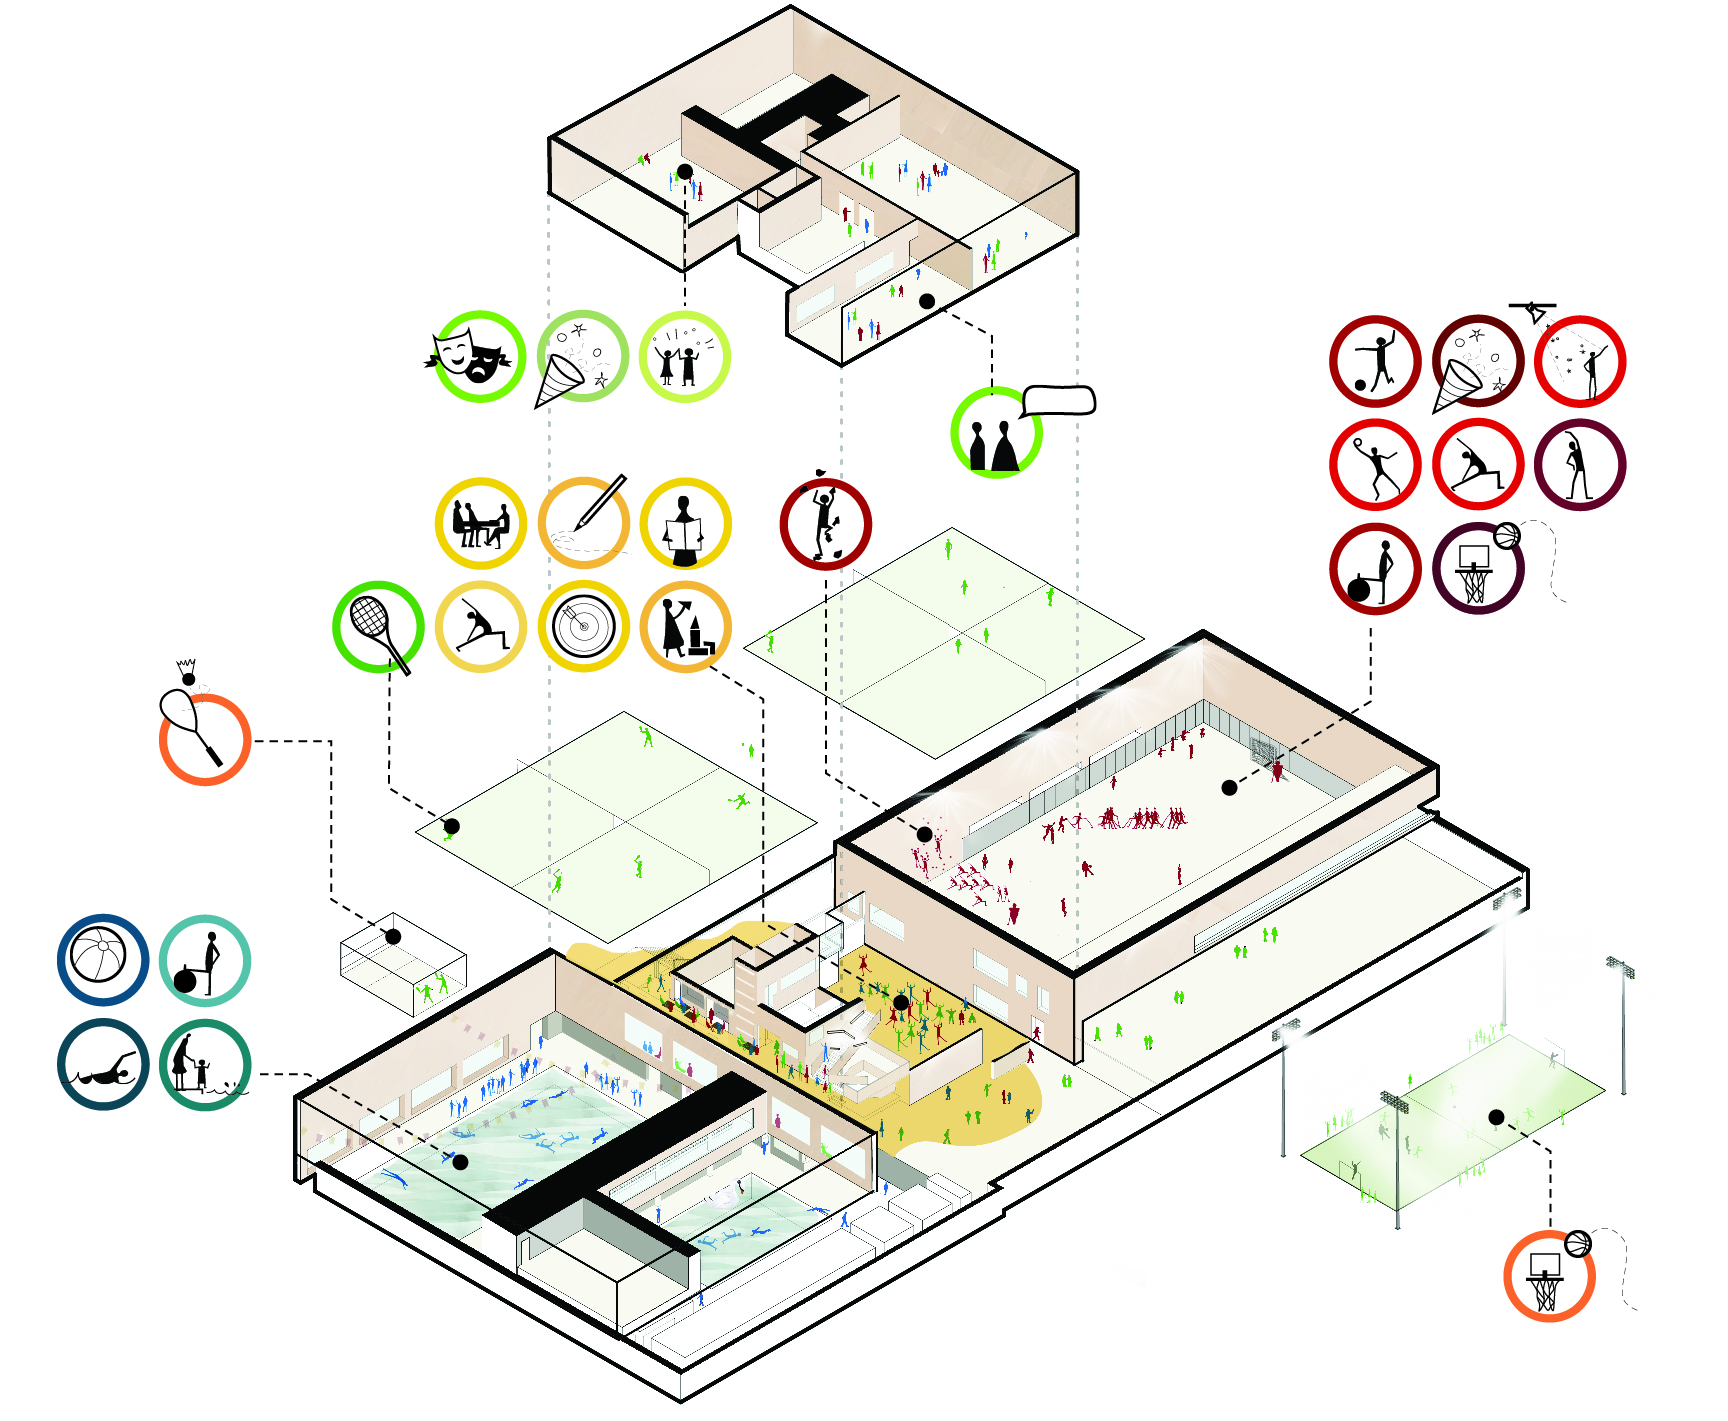 MFC Doelum, designed by NOAHH | Network Oriented Architecture